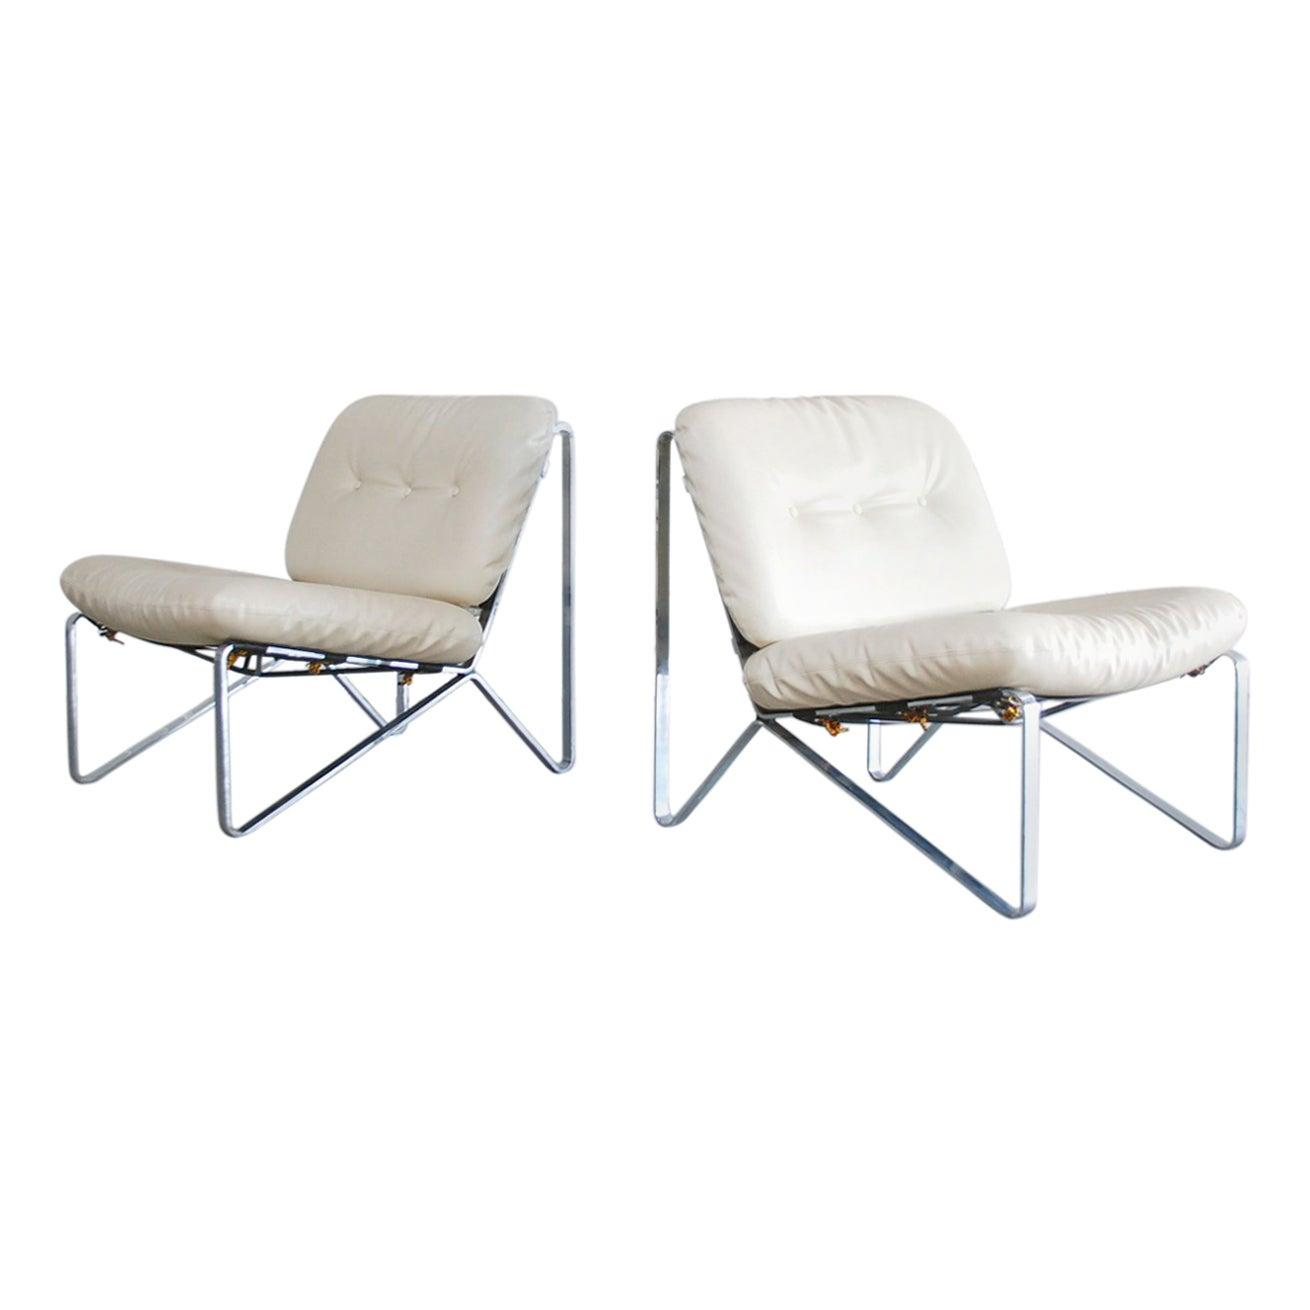 Hartmut Lohmeyer Pair of Lounge Chairs for Mauser Werke Waldeck, 1960